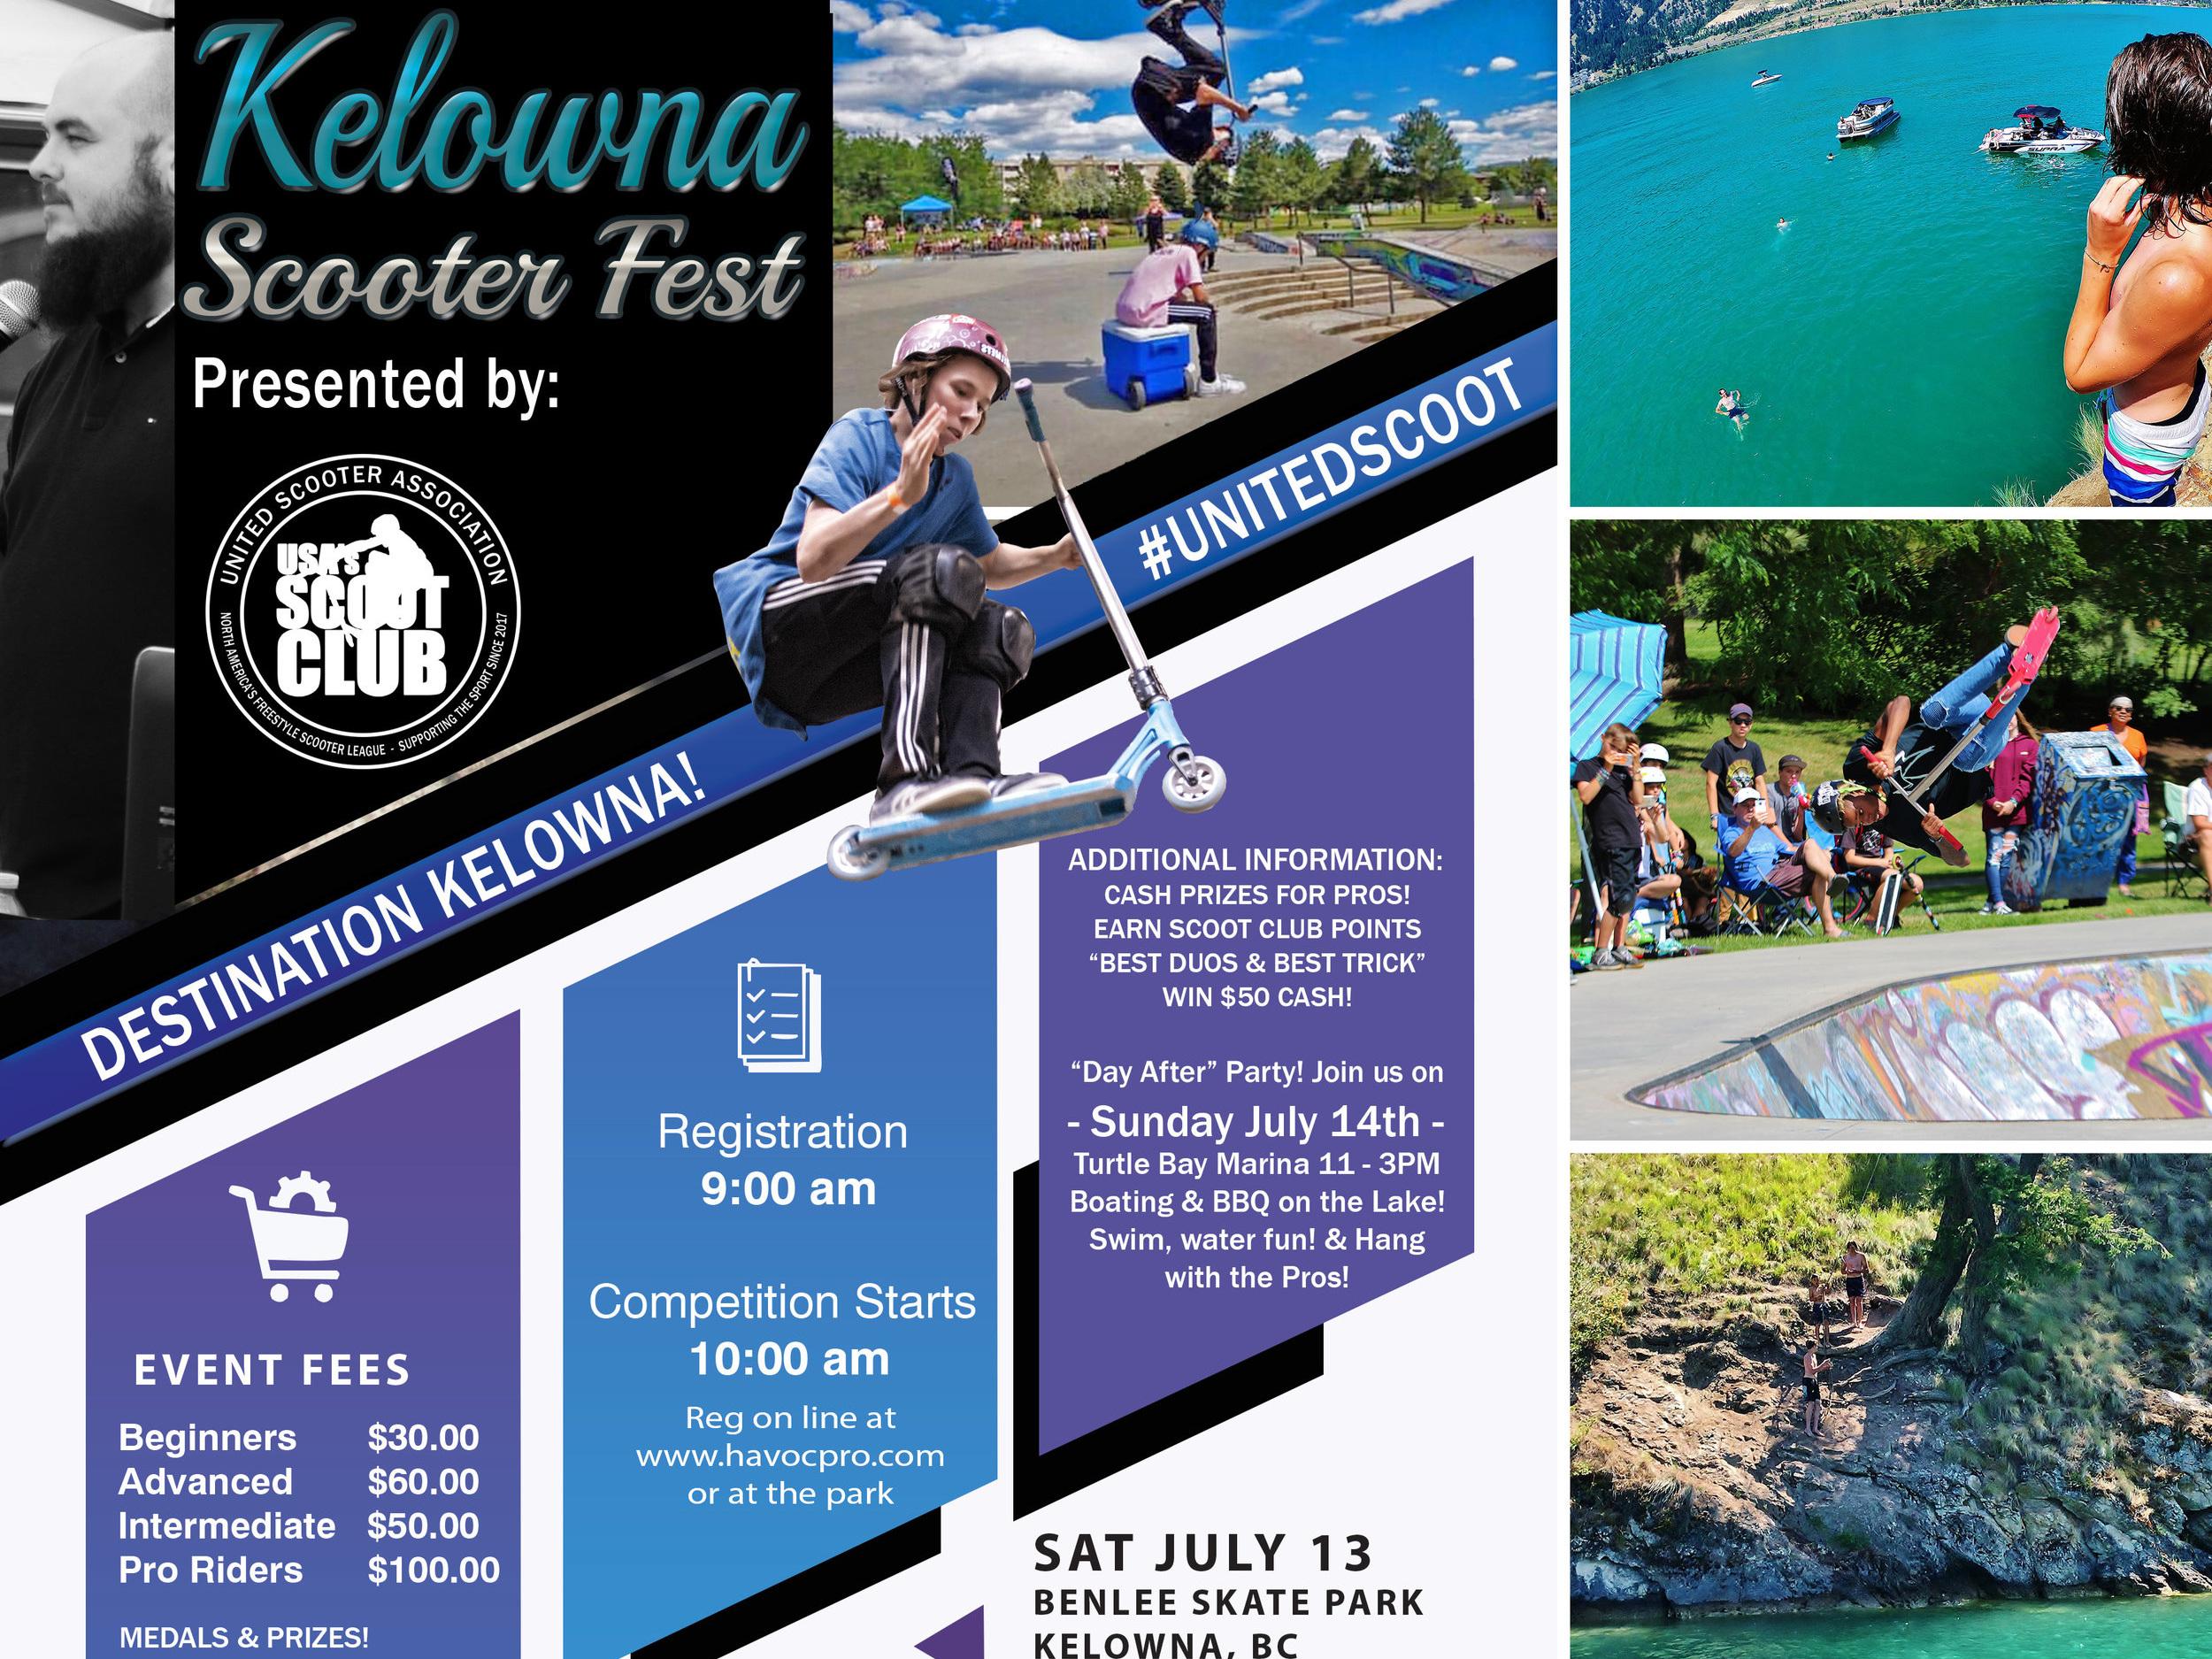 6/22/2019 - Kelona ScootFest, Benlee Park, Kelowna, Canada (x1.5pts)